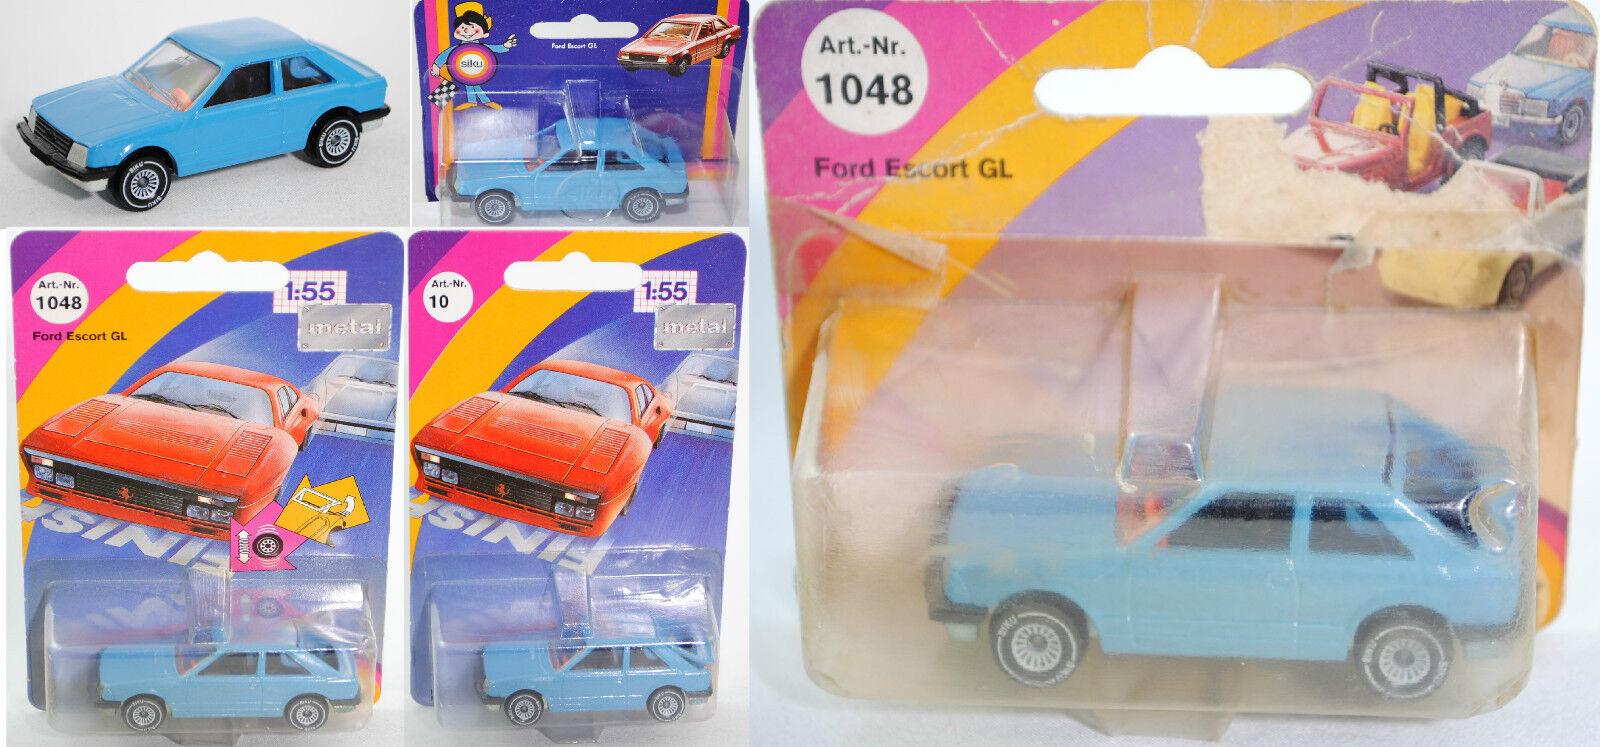 Siku Super 1048 Ford Escort 1.6 GL Dreitürer, ca. 1 55  | Überlegene Qualität